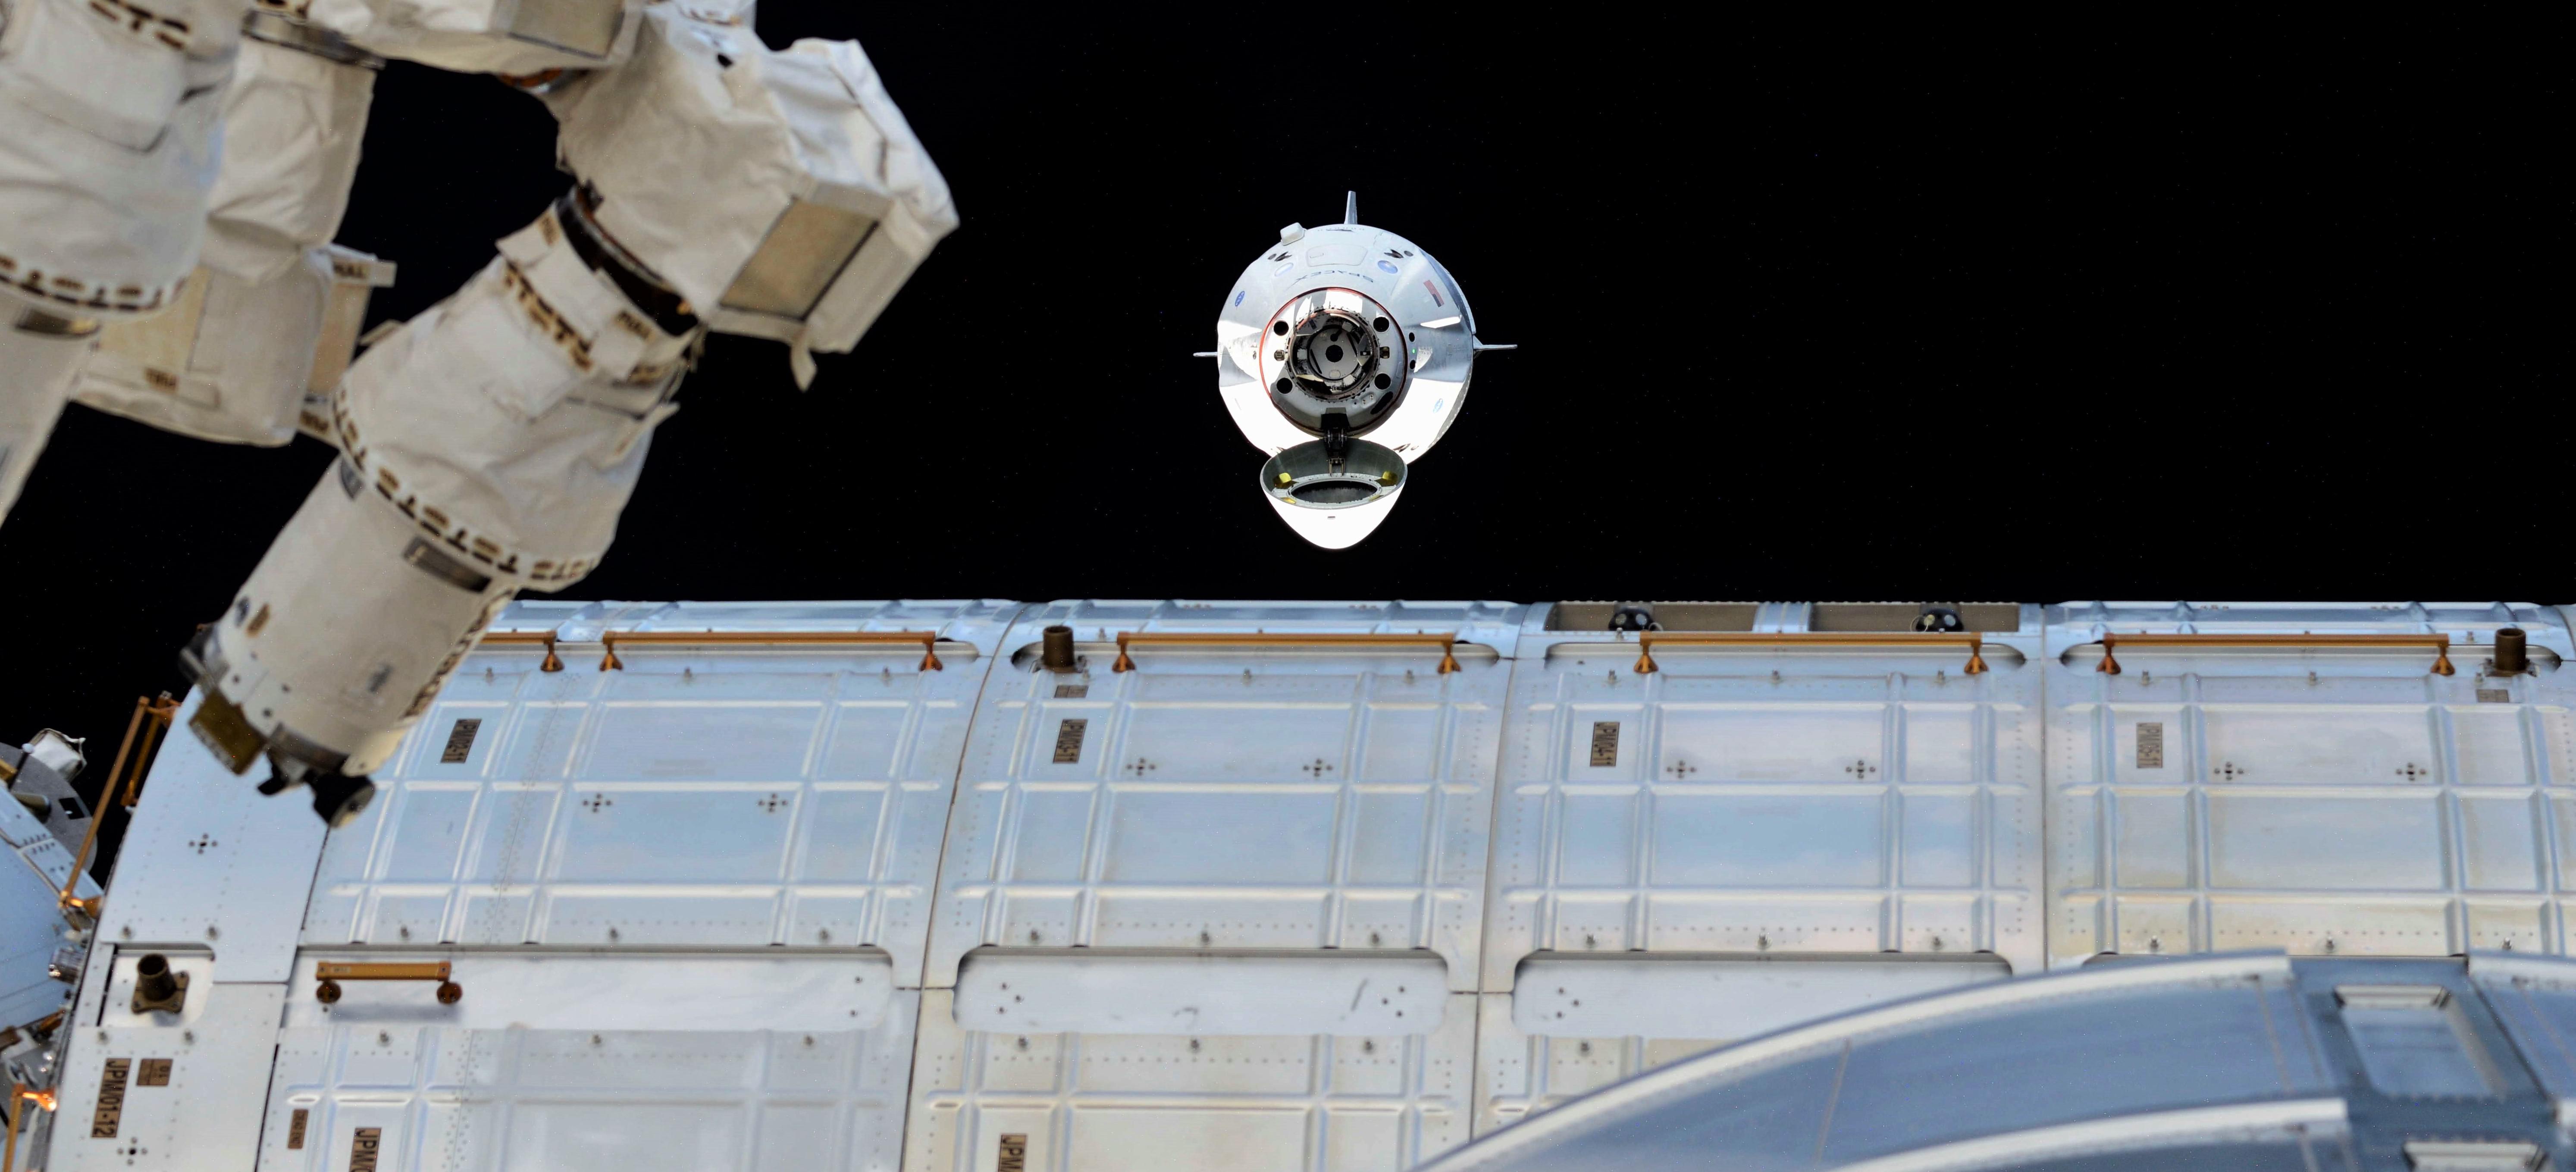 Crew Dragon DM-1 ISS arrival 030319 (Oleg Kononenko) 1 crop (c)